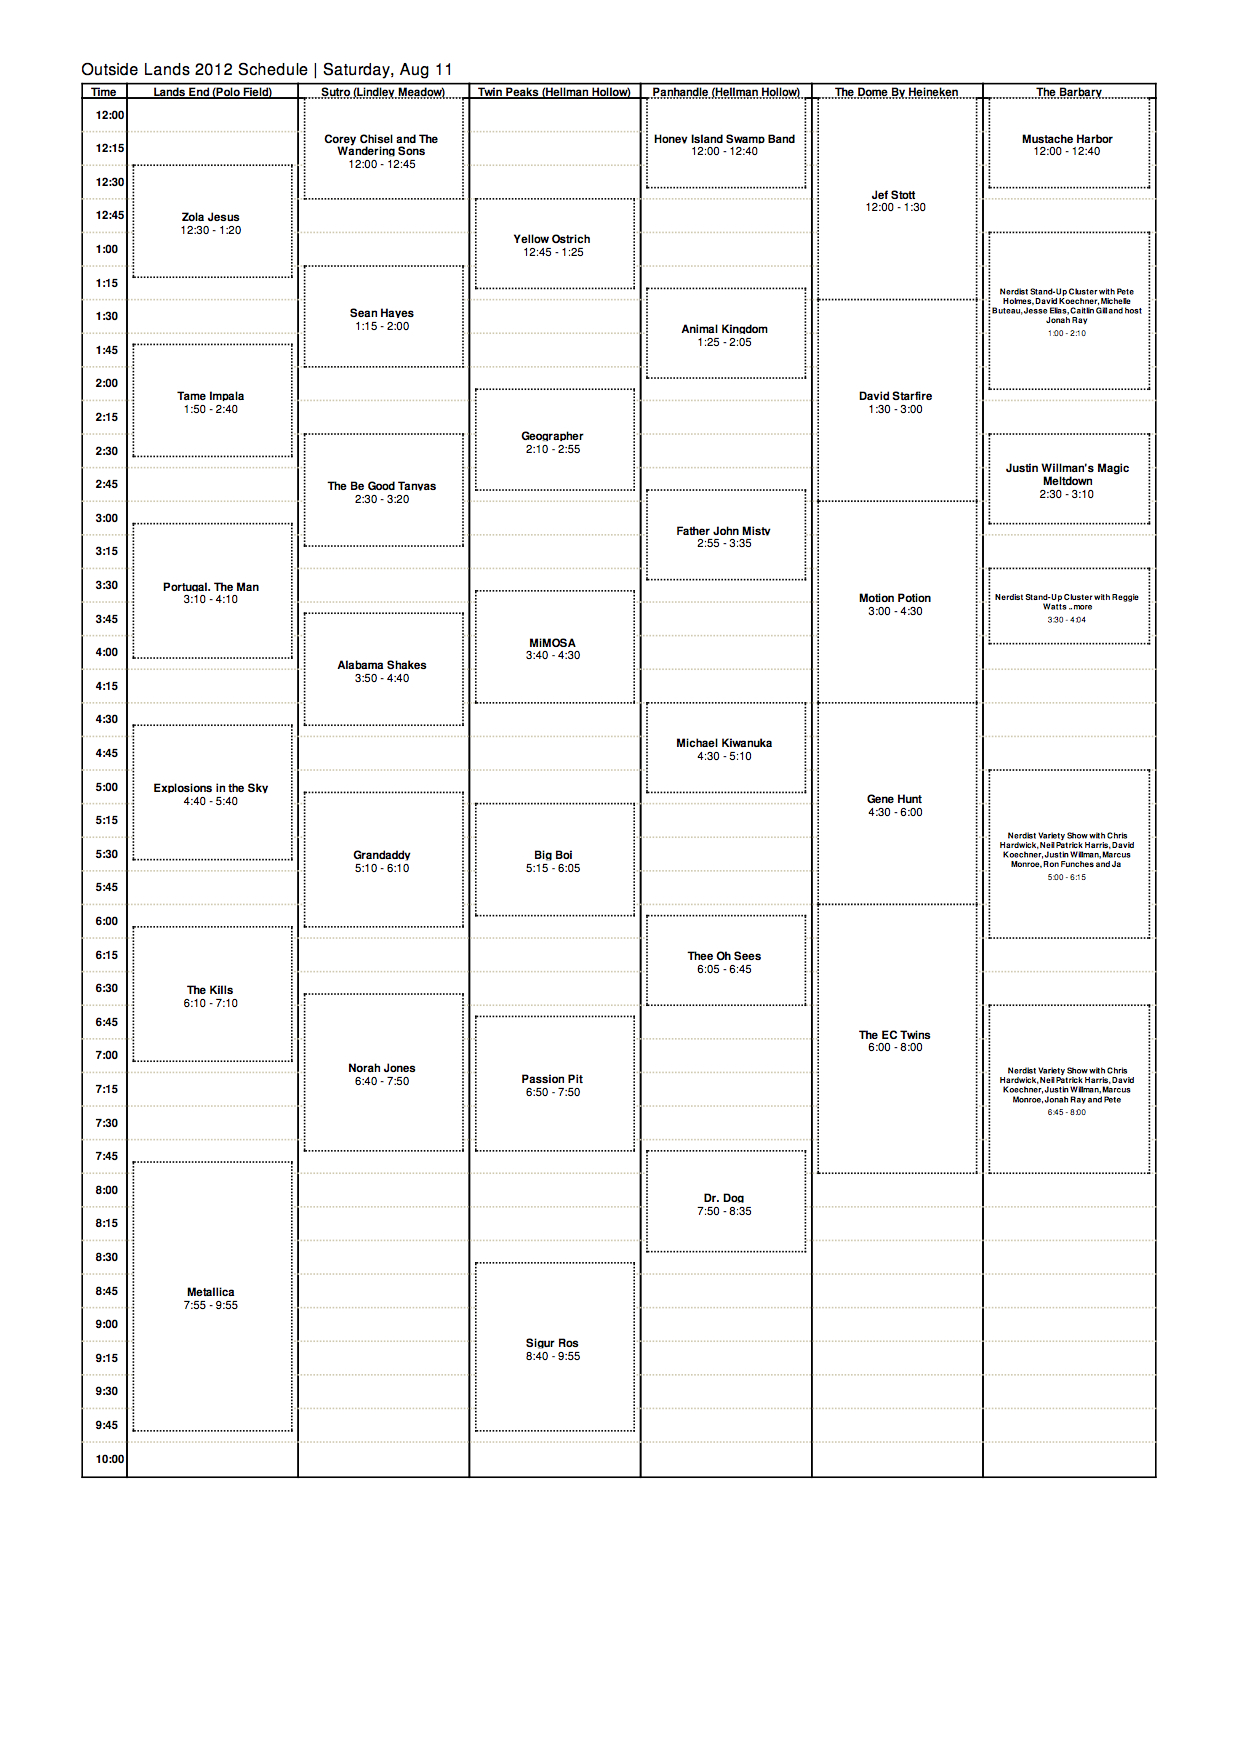 osl 2012 sat Outside Lands reveals 2012 schedule